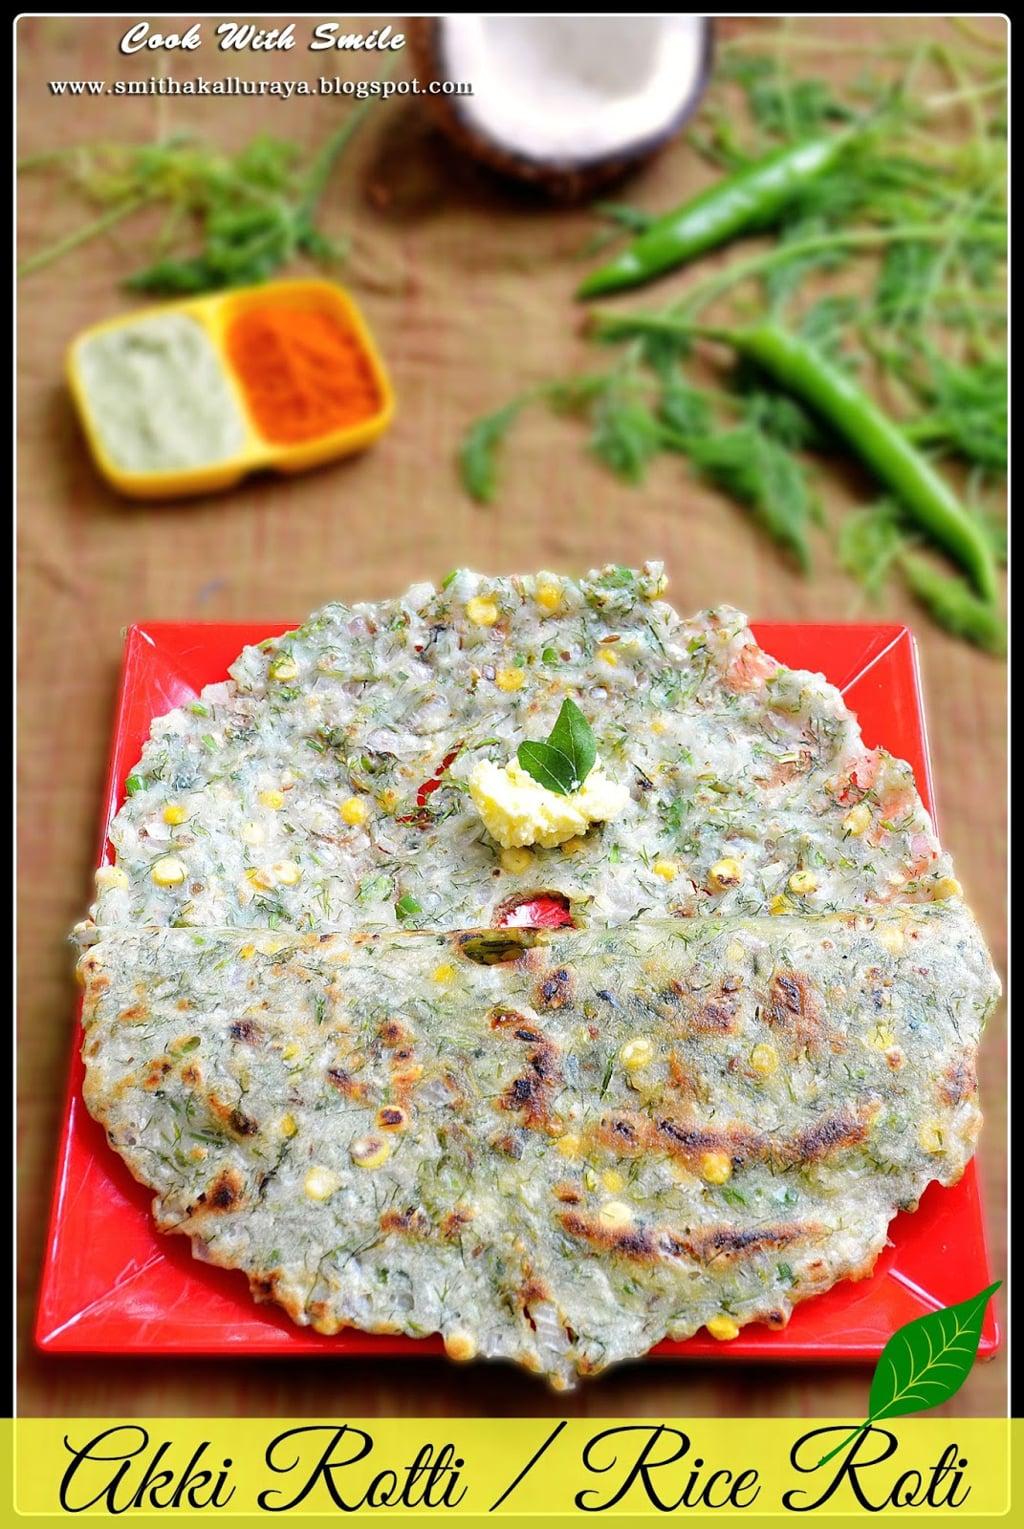 pics 10 Delicious Karnataka Breakfast Recipes You Must Try